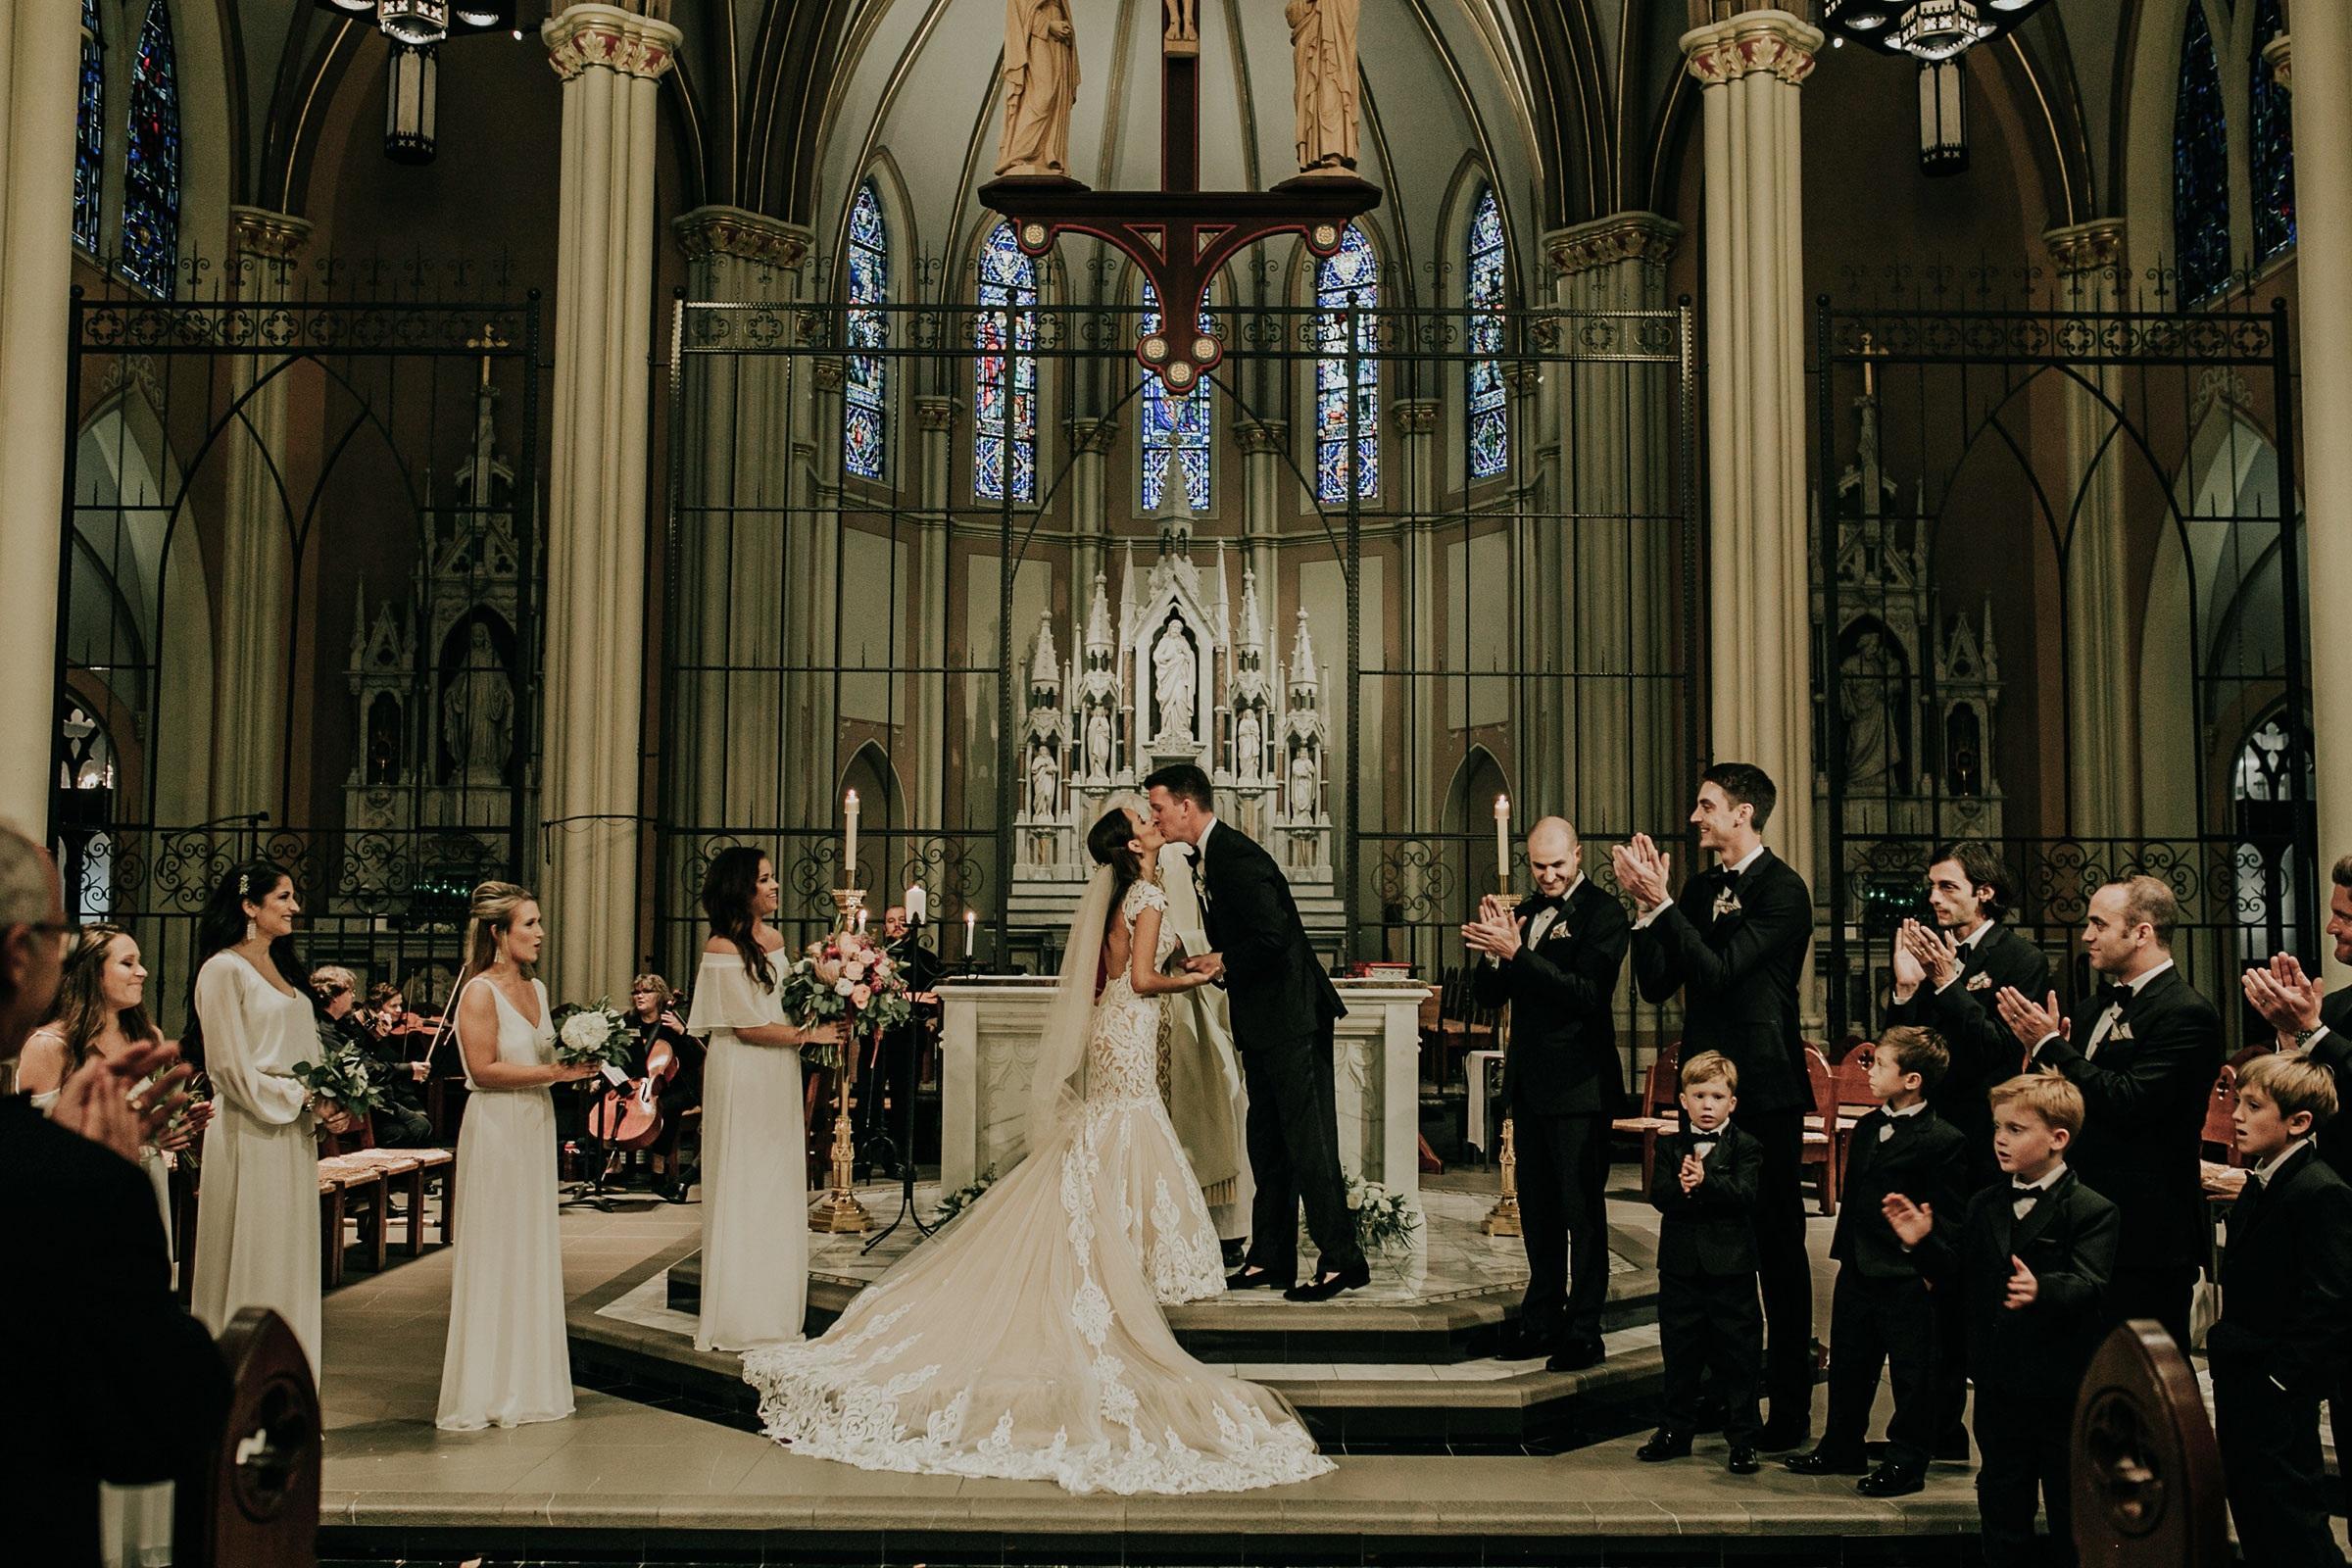 bride-groom-kiss-at-ceremony-st-johns-church-at-creighton-omaha-nebraska-raelyn-ramey-photography.jpg